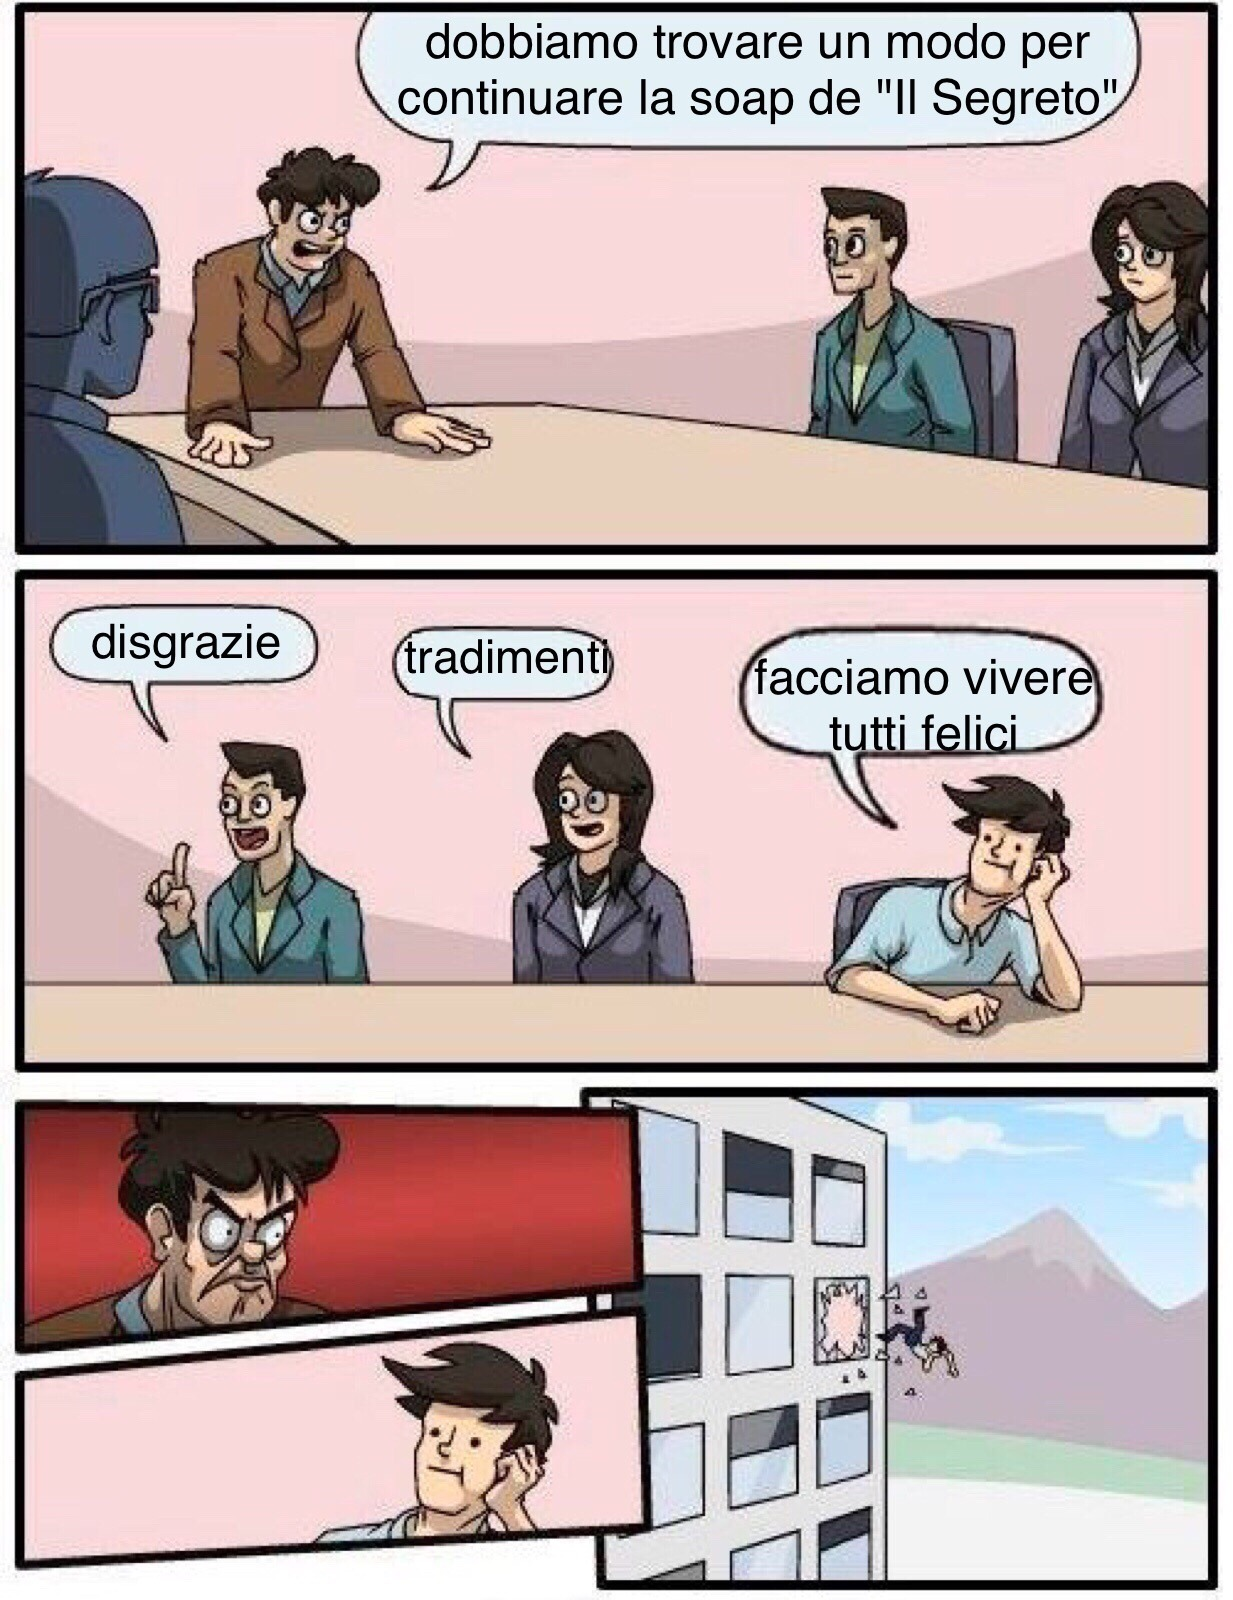 Il Segreto - meme